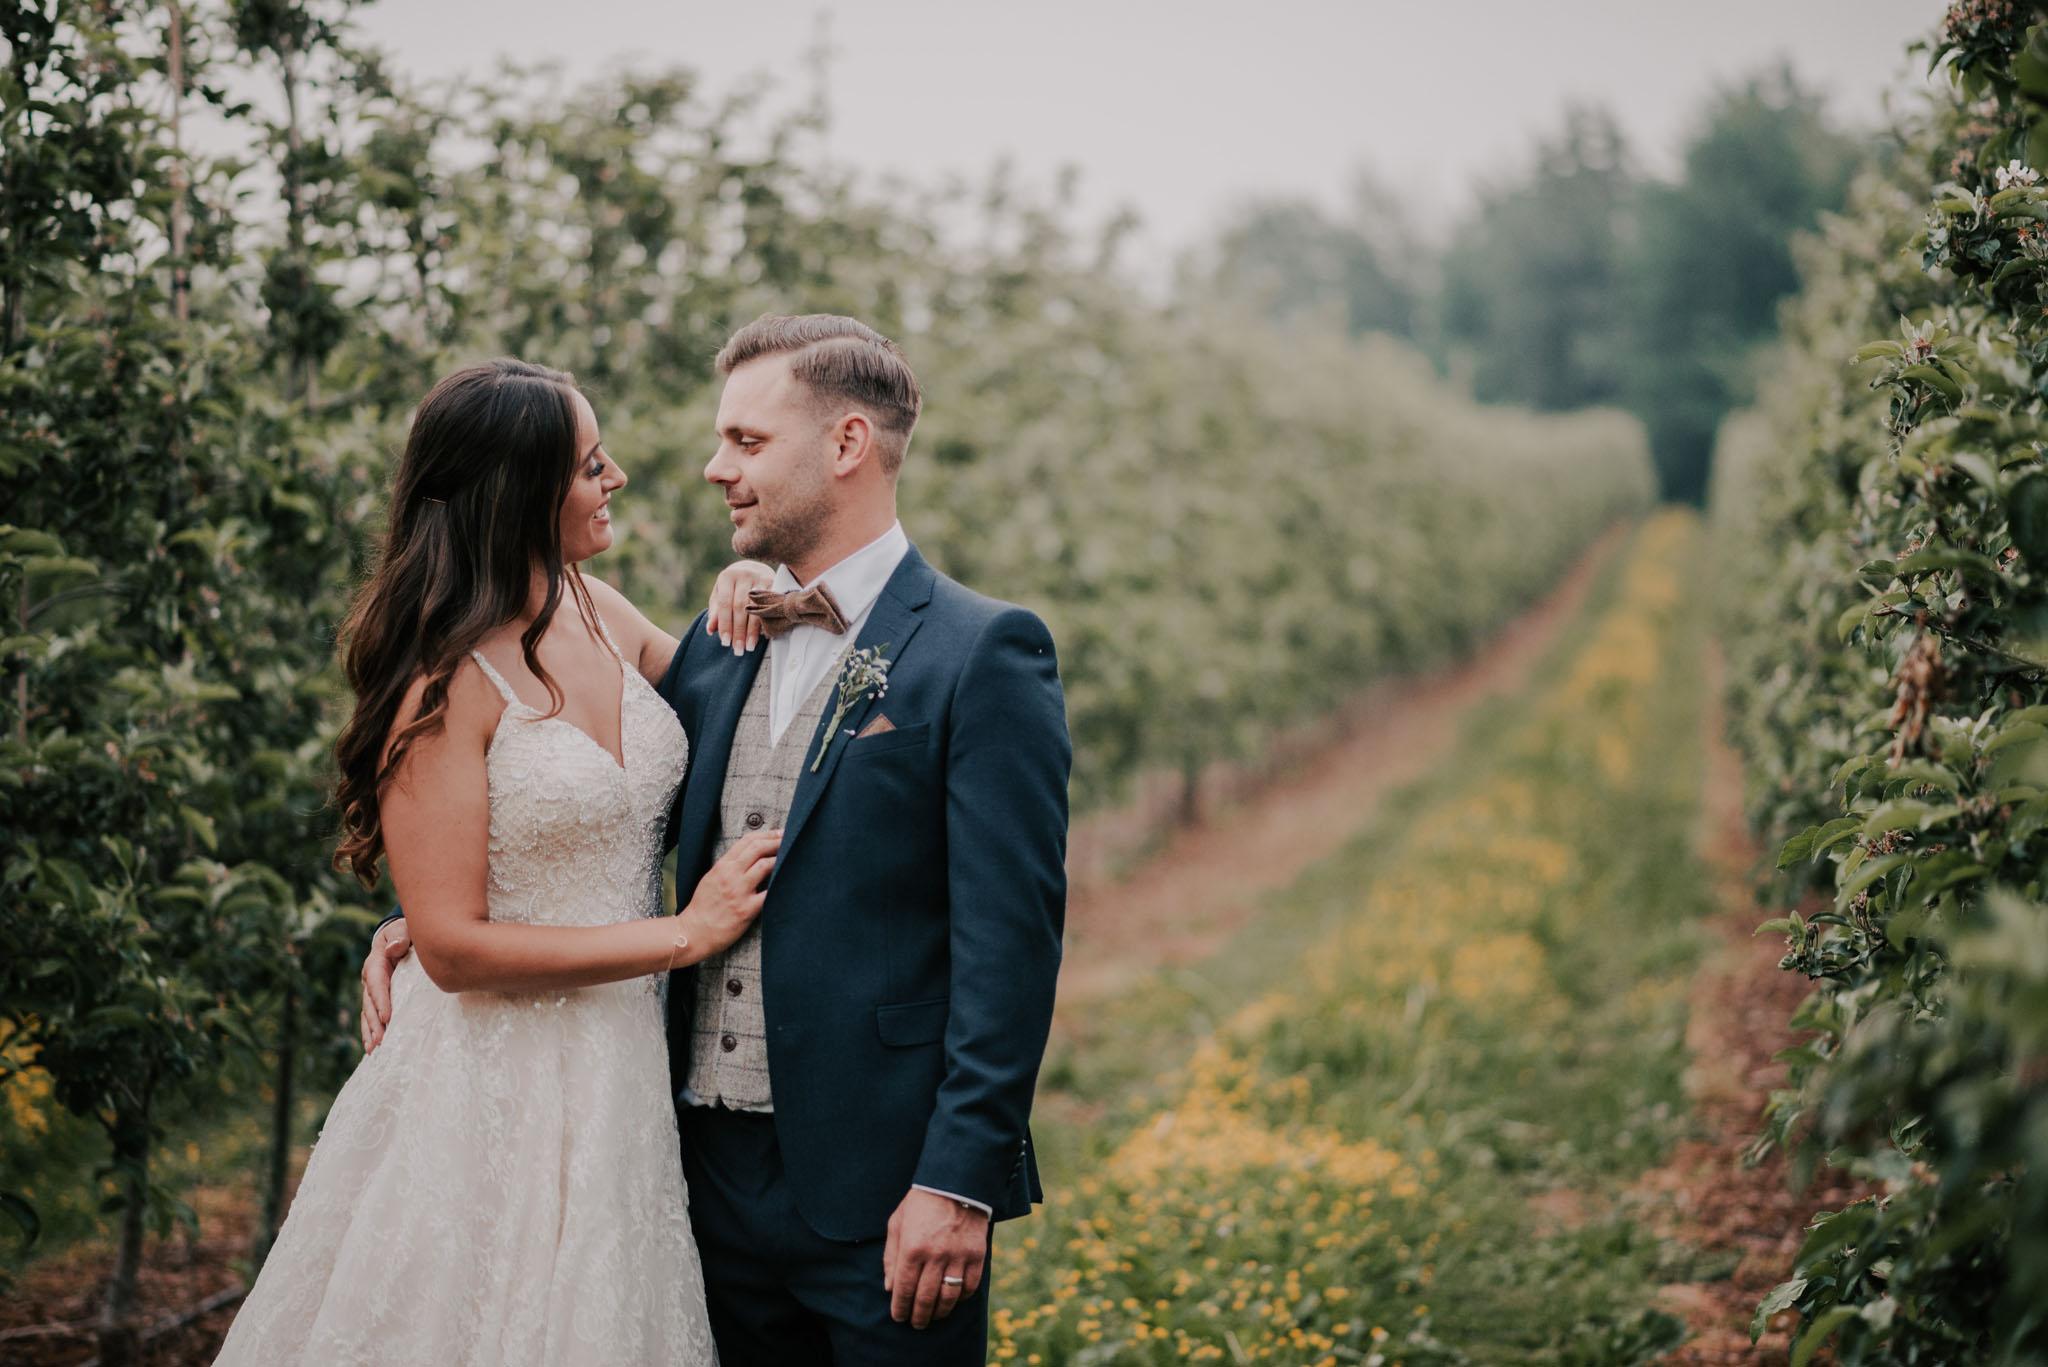 wedding-photographer-glewstone-court-hereford-scott-stockwell-photography453.jpg